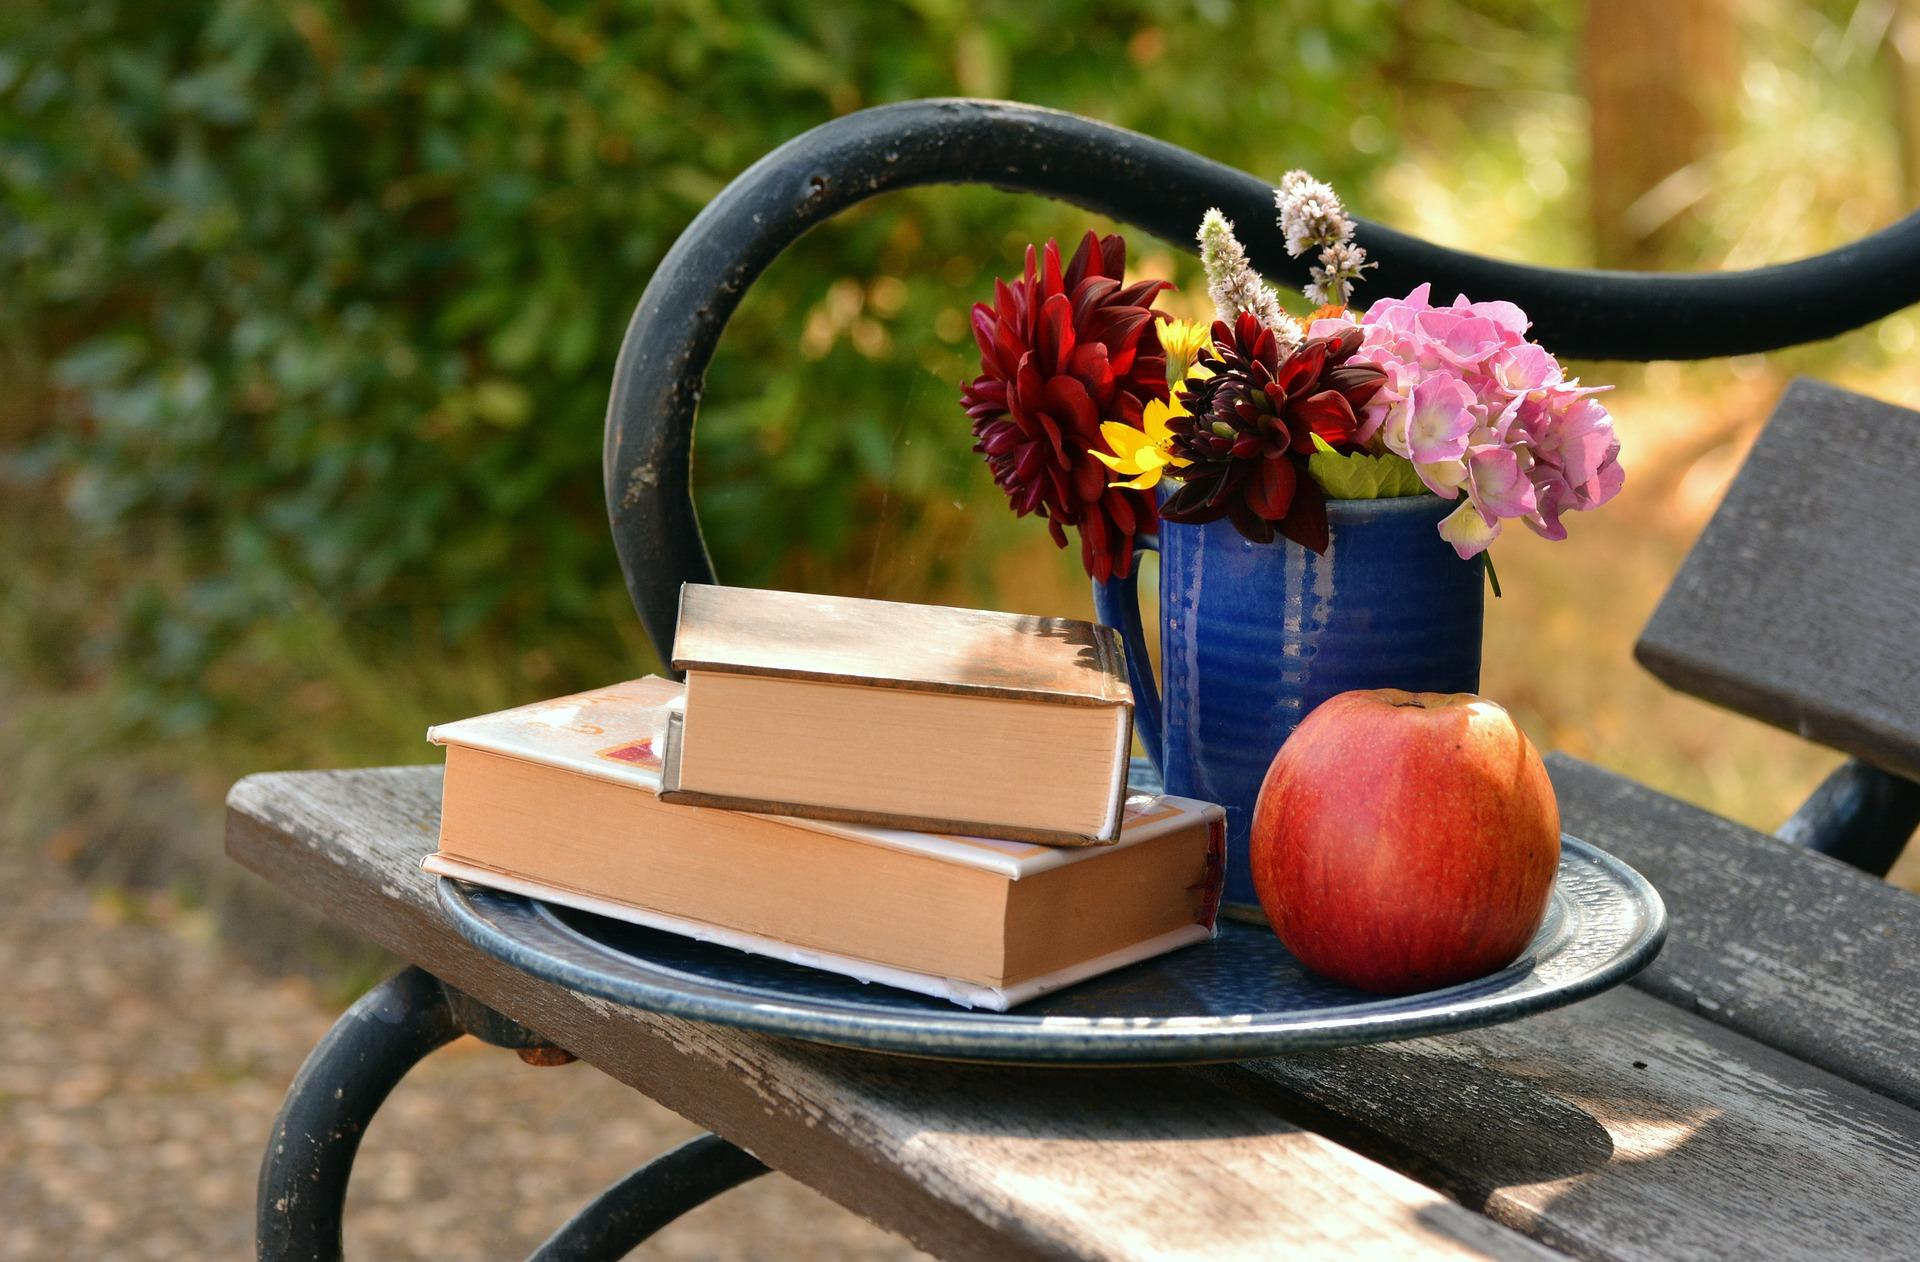 books-1578589_1920 (c) www.pixabay.com